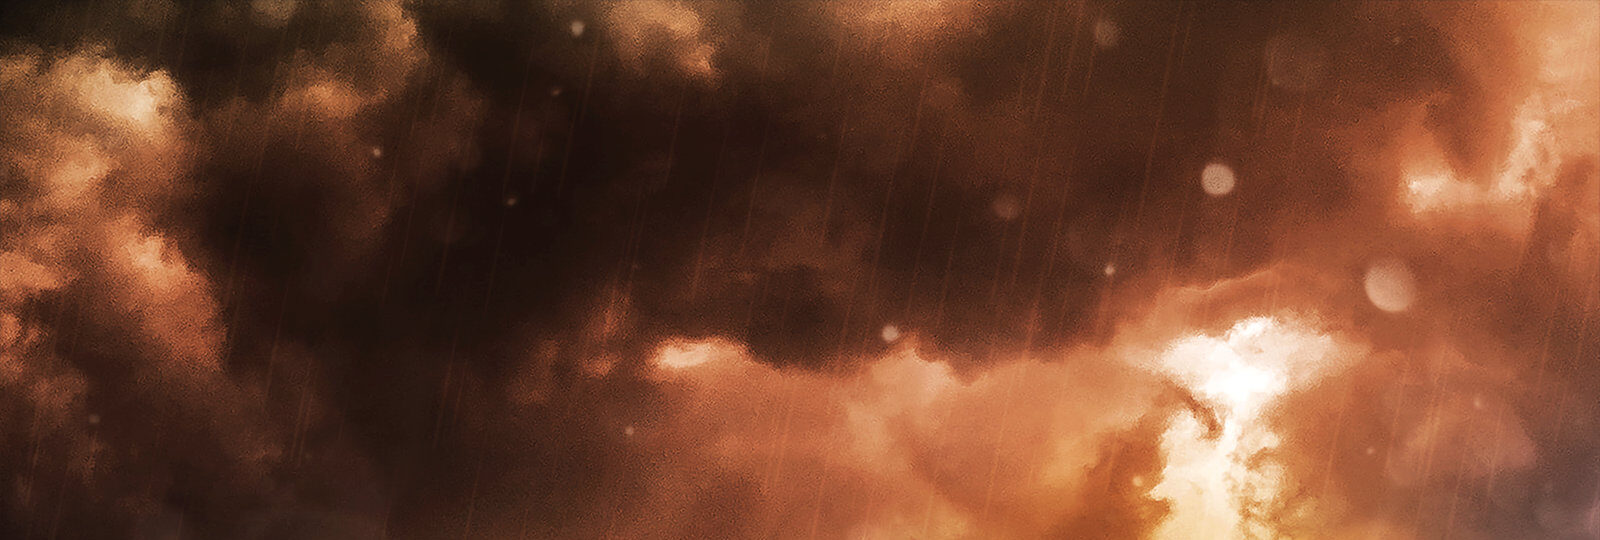 Syndrome - fire sky